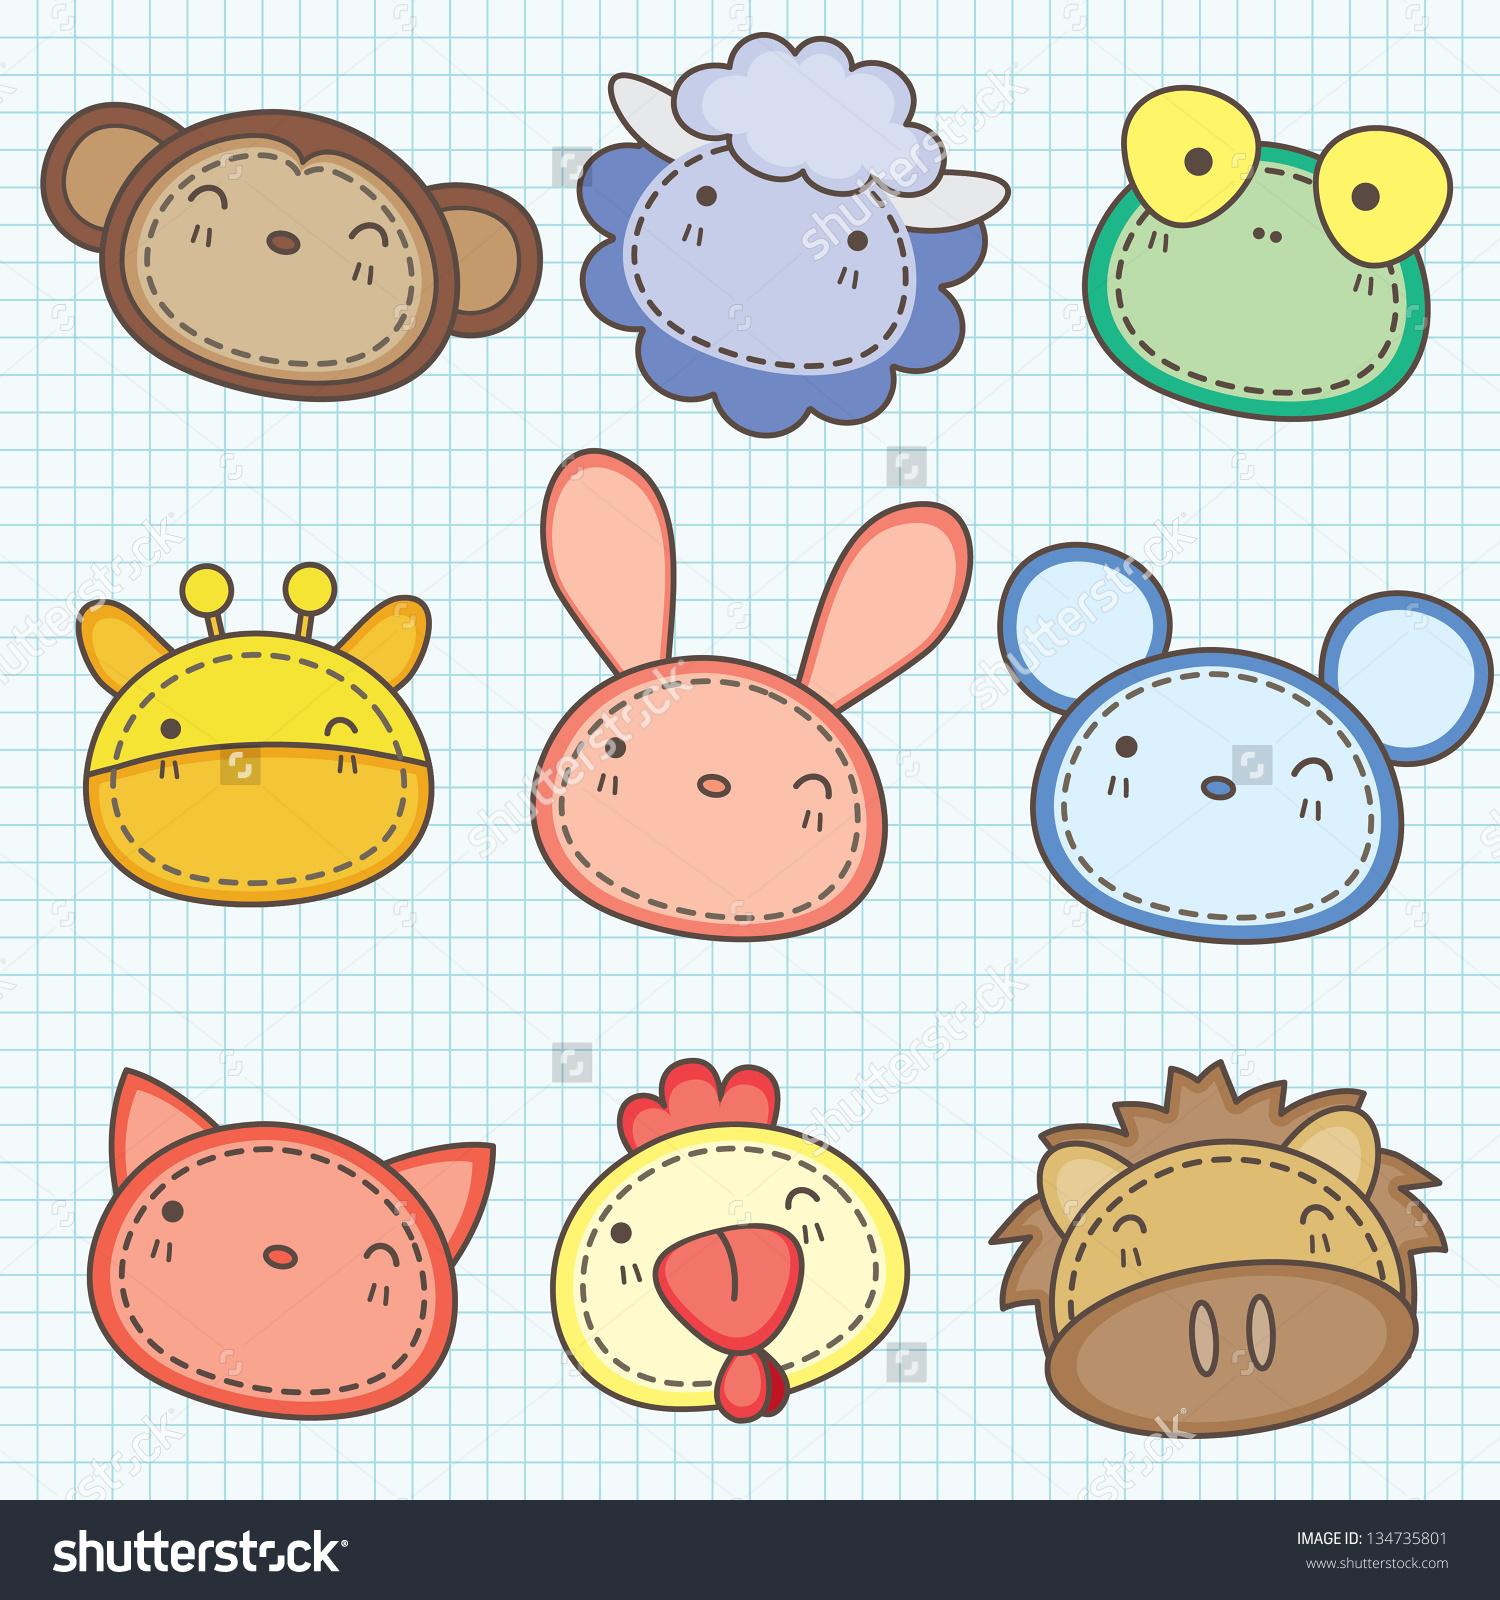 Cute Animals Head Clip Art Stock Vector 134735801.